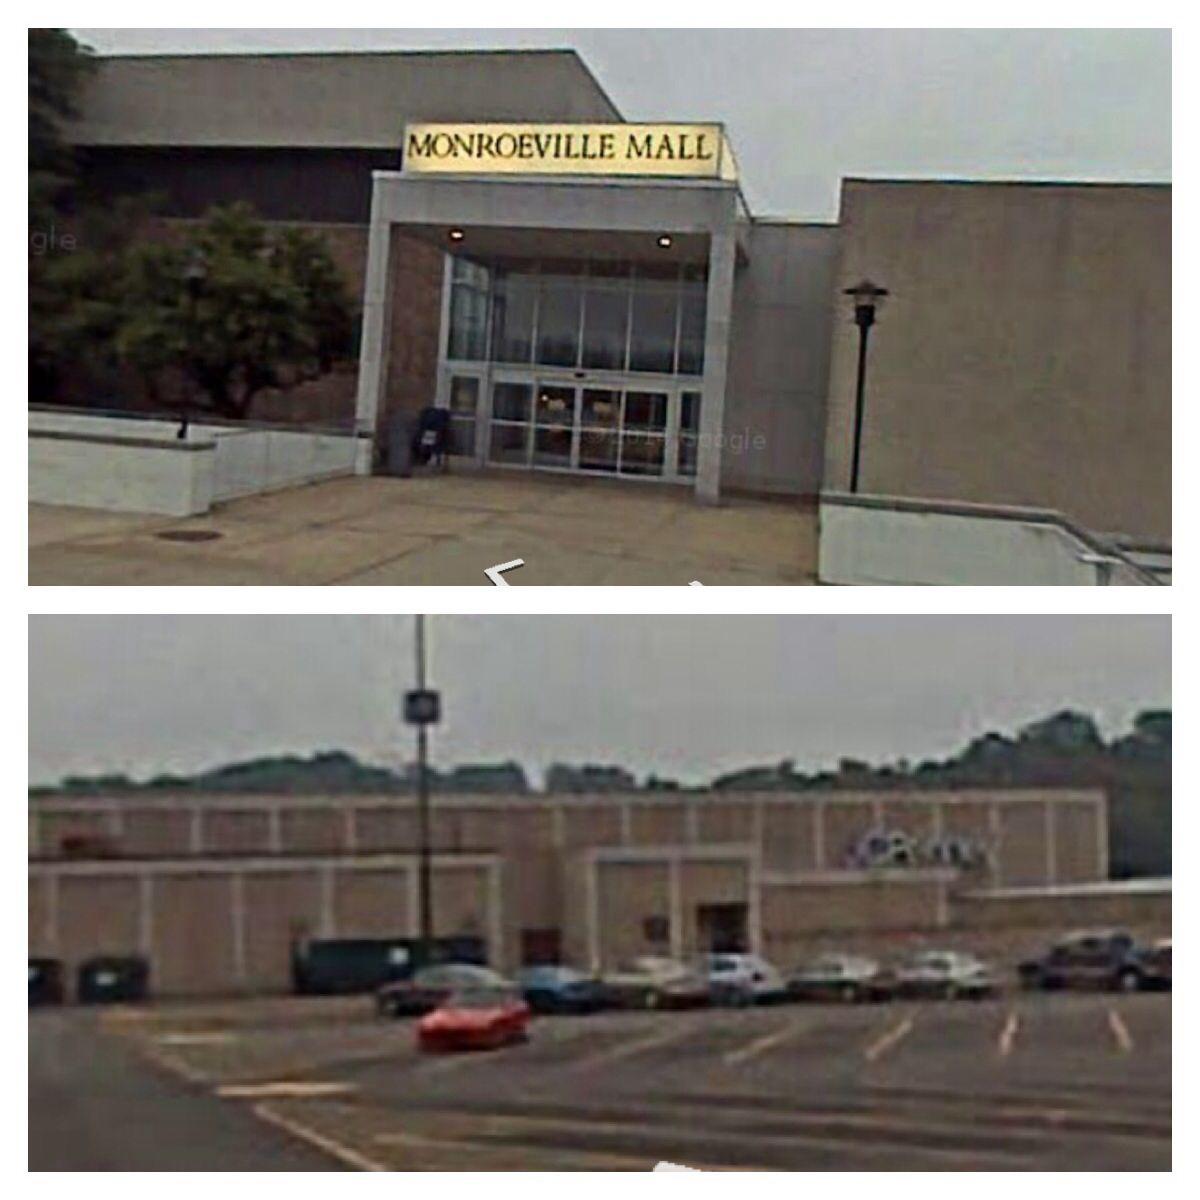 Monroeville Mall, 161 Monroeville Mall, Monroeville, PA--\